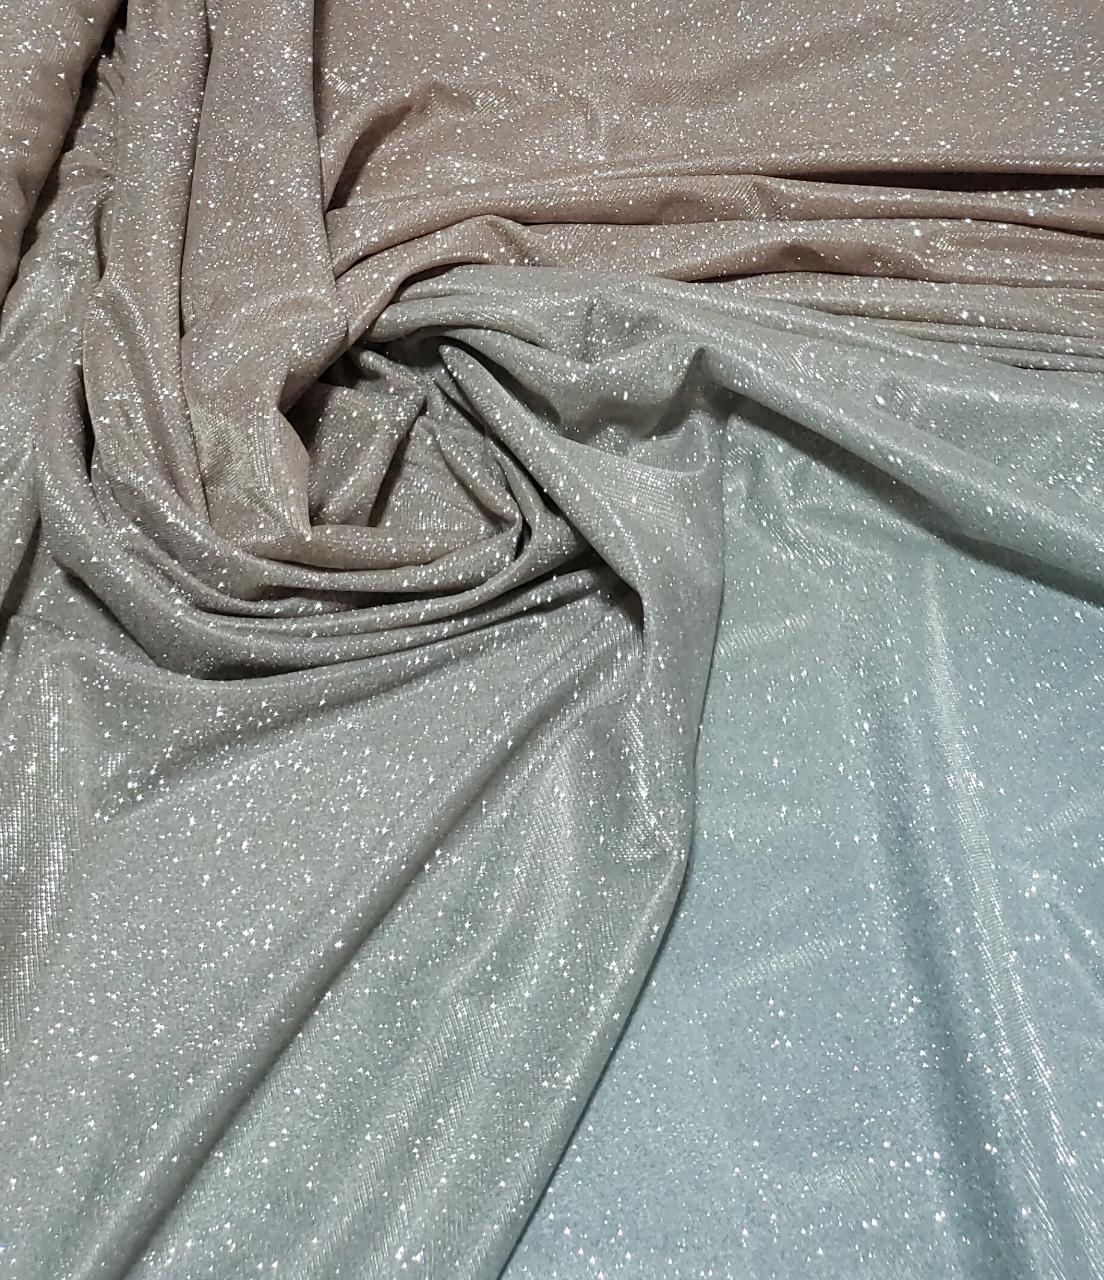 Lurex com Glitter Degradê Goiaba com Prata